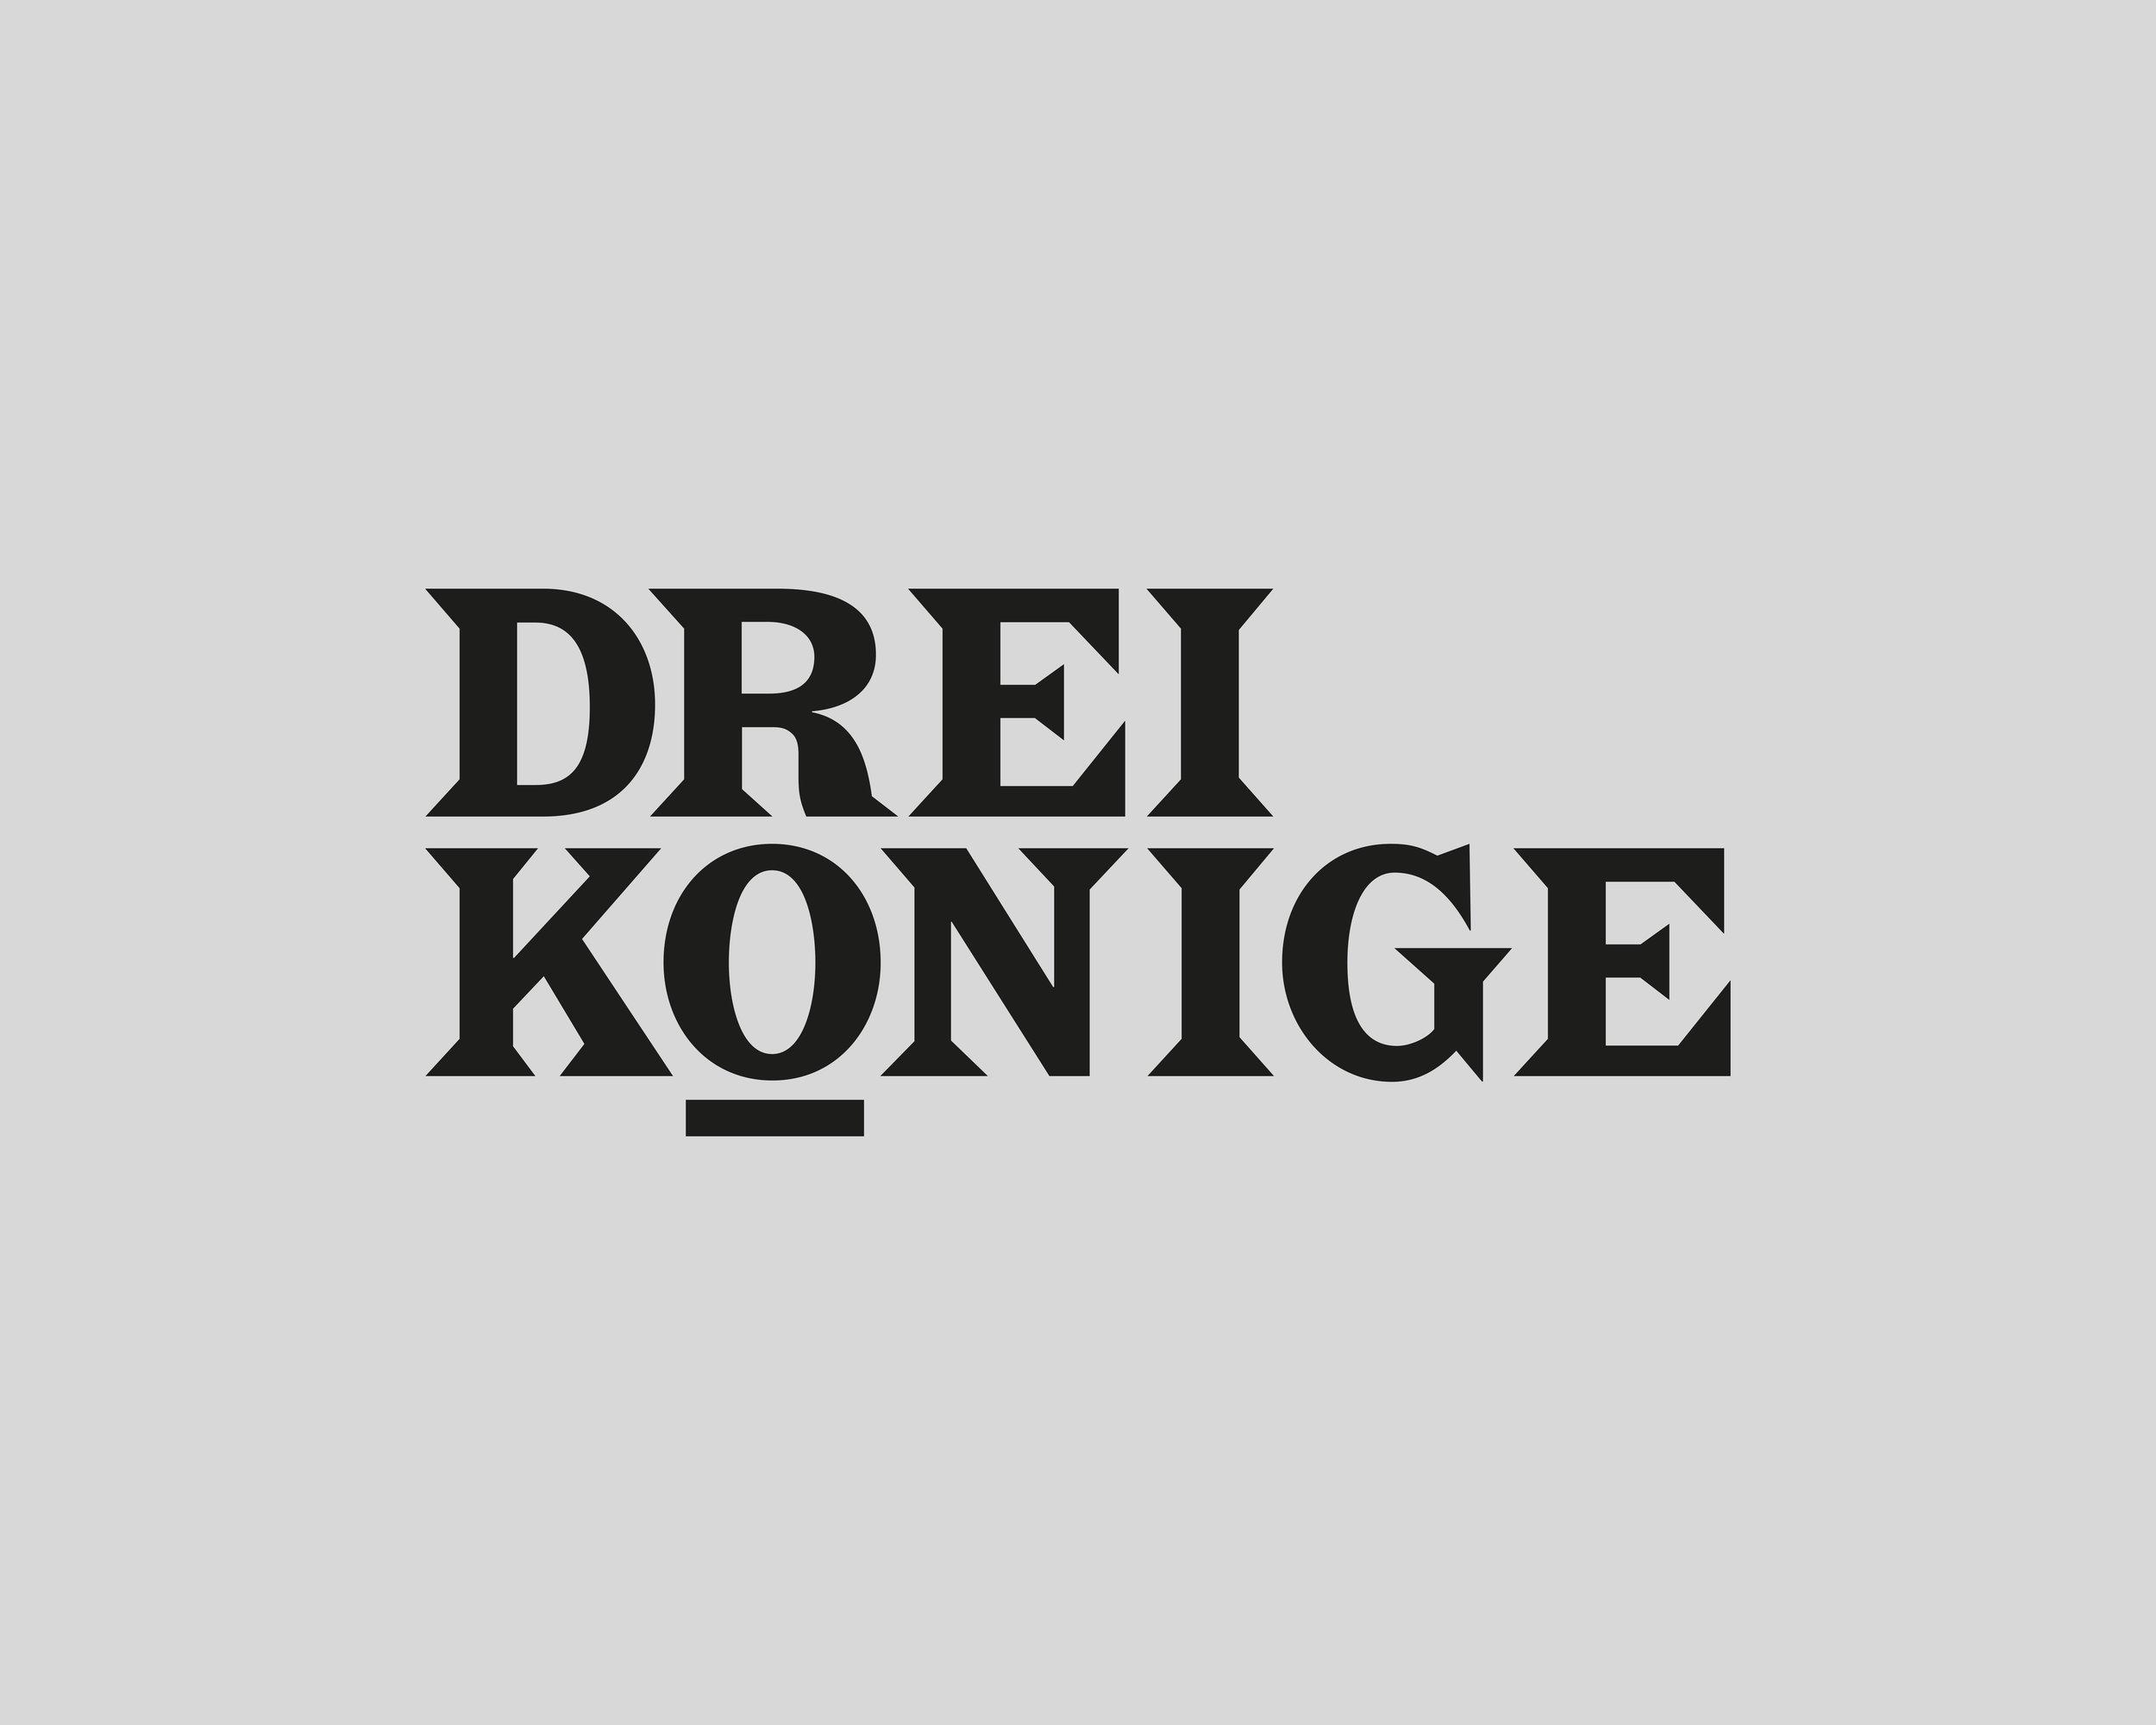 3k_Logo.jpg